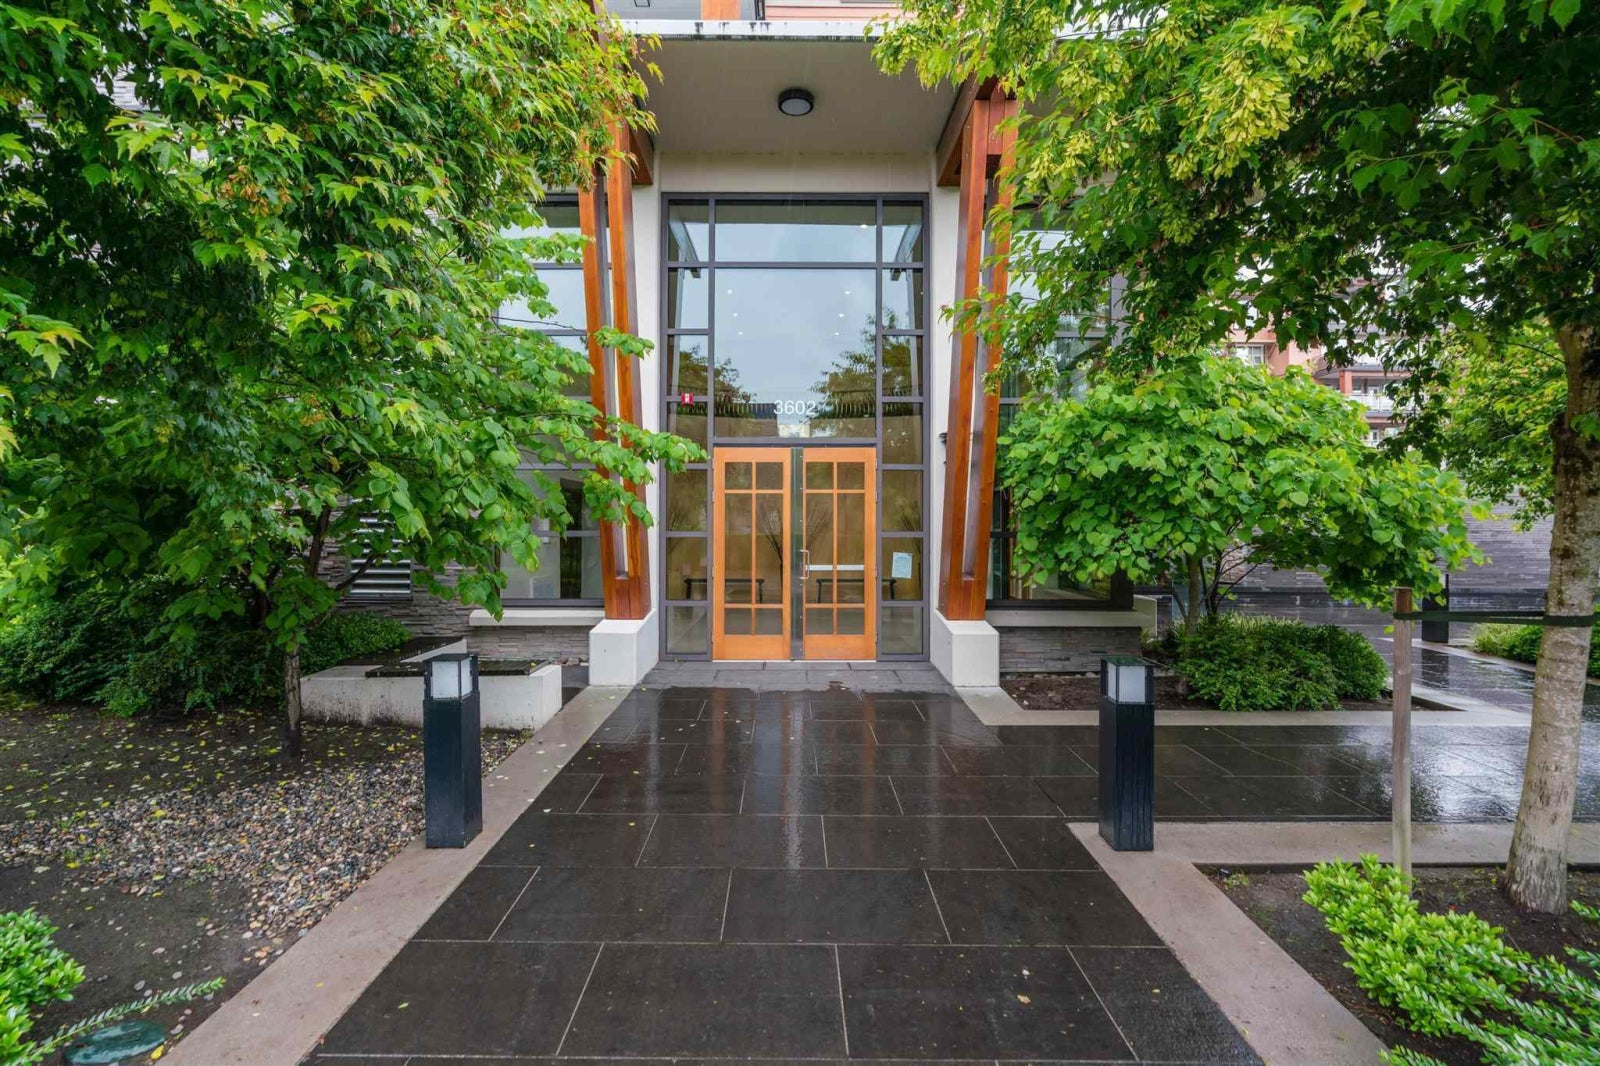 222 3602 ALDERCREST DRIVE - Roche Point Apartment/Condo for sale, 2 Bedrooms (R2603975) #17